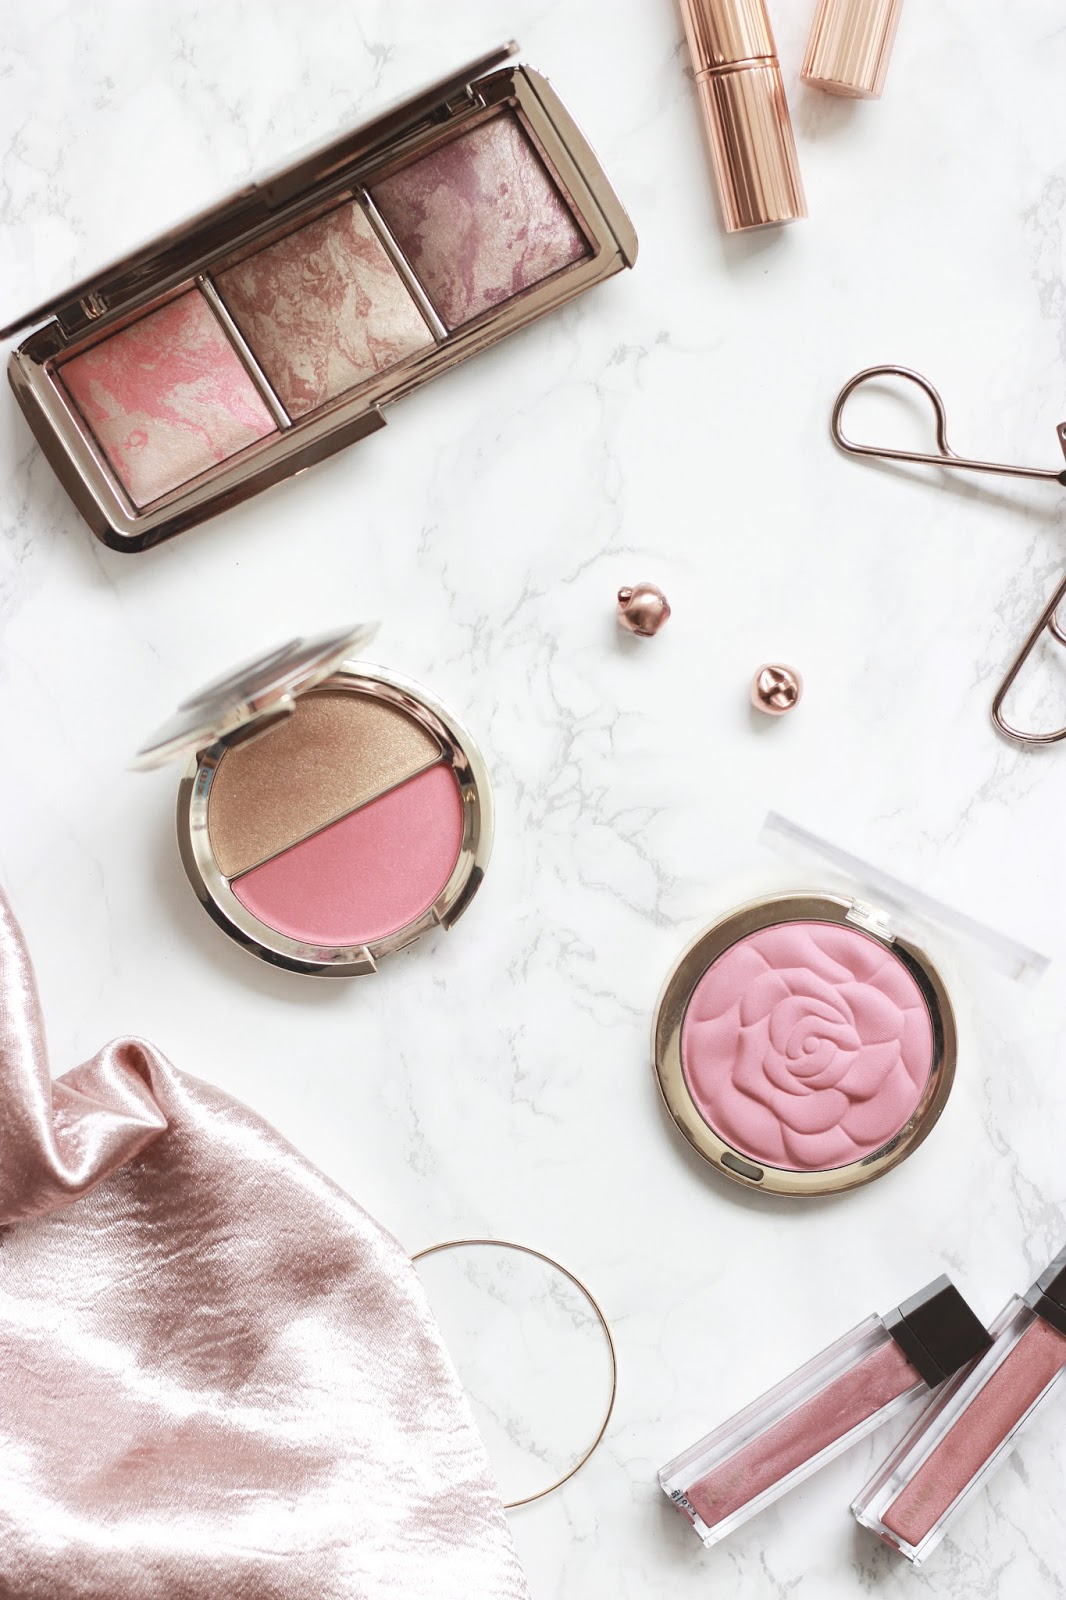 Hourglass Strobe Lighting Blusher, NYX ombre blush, milani rose blusher